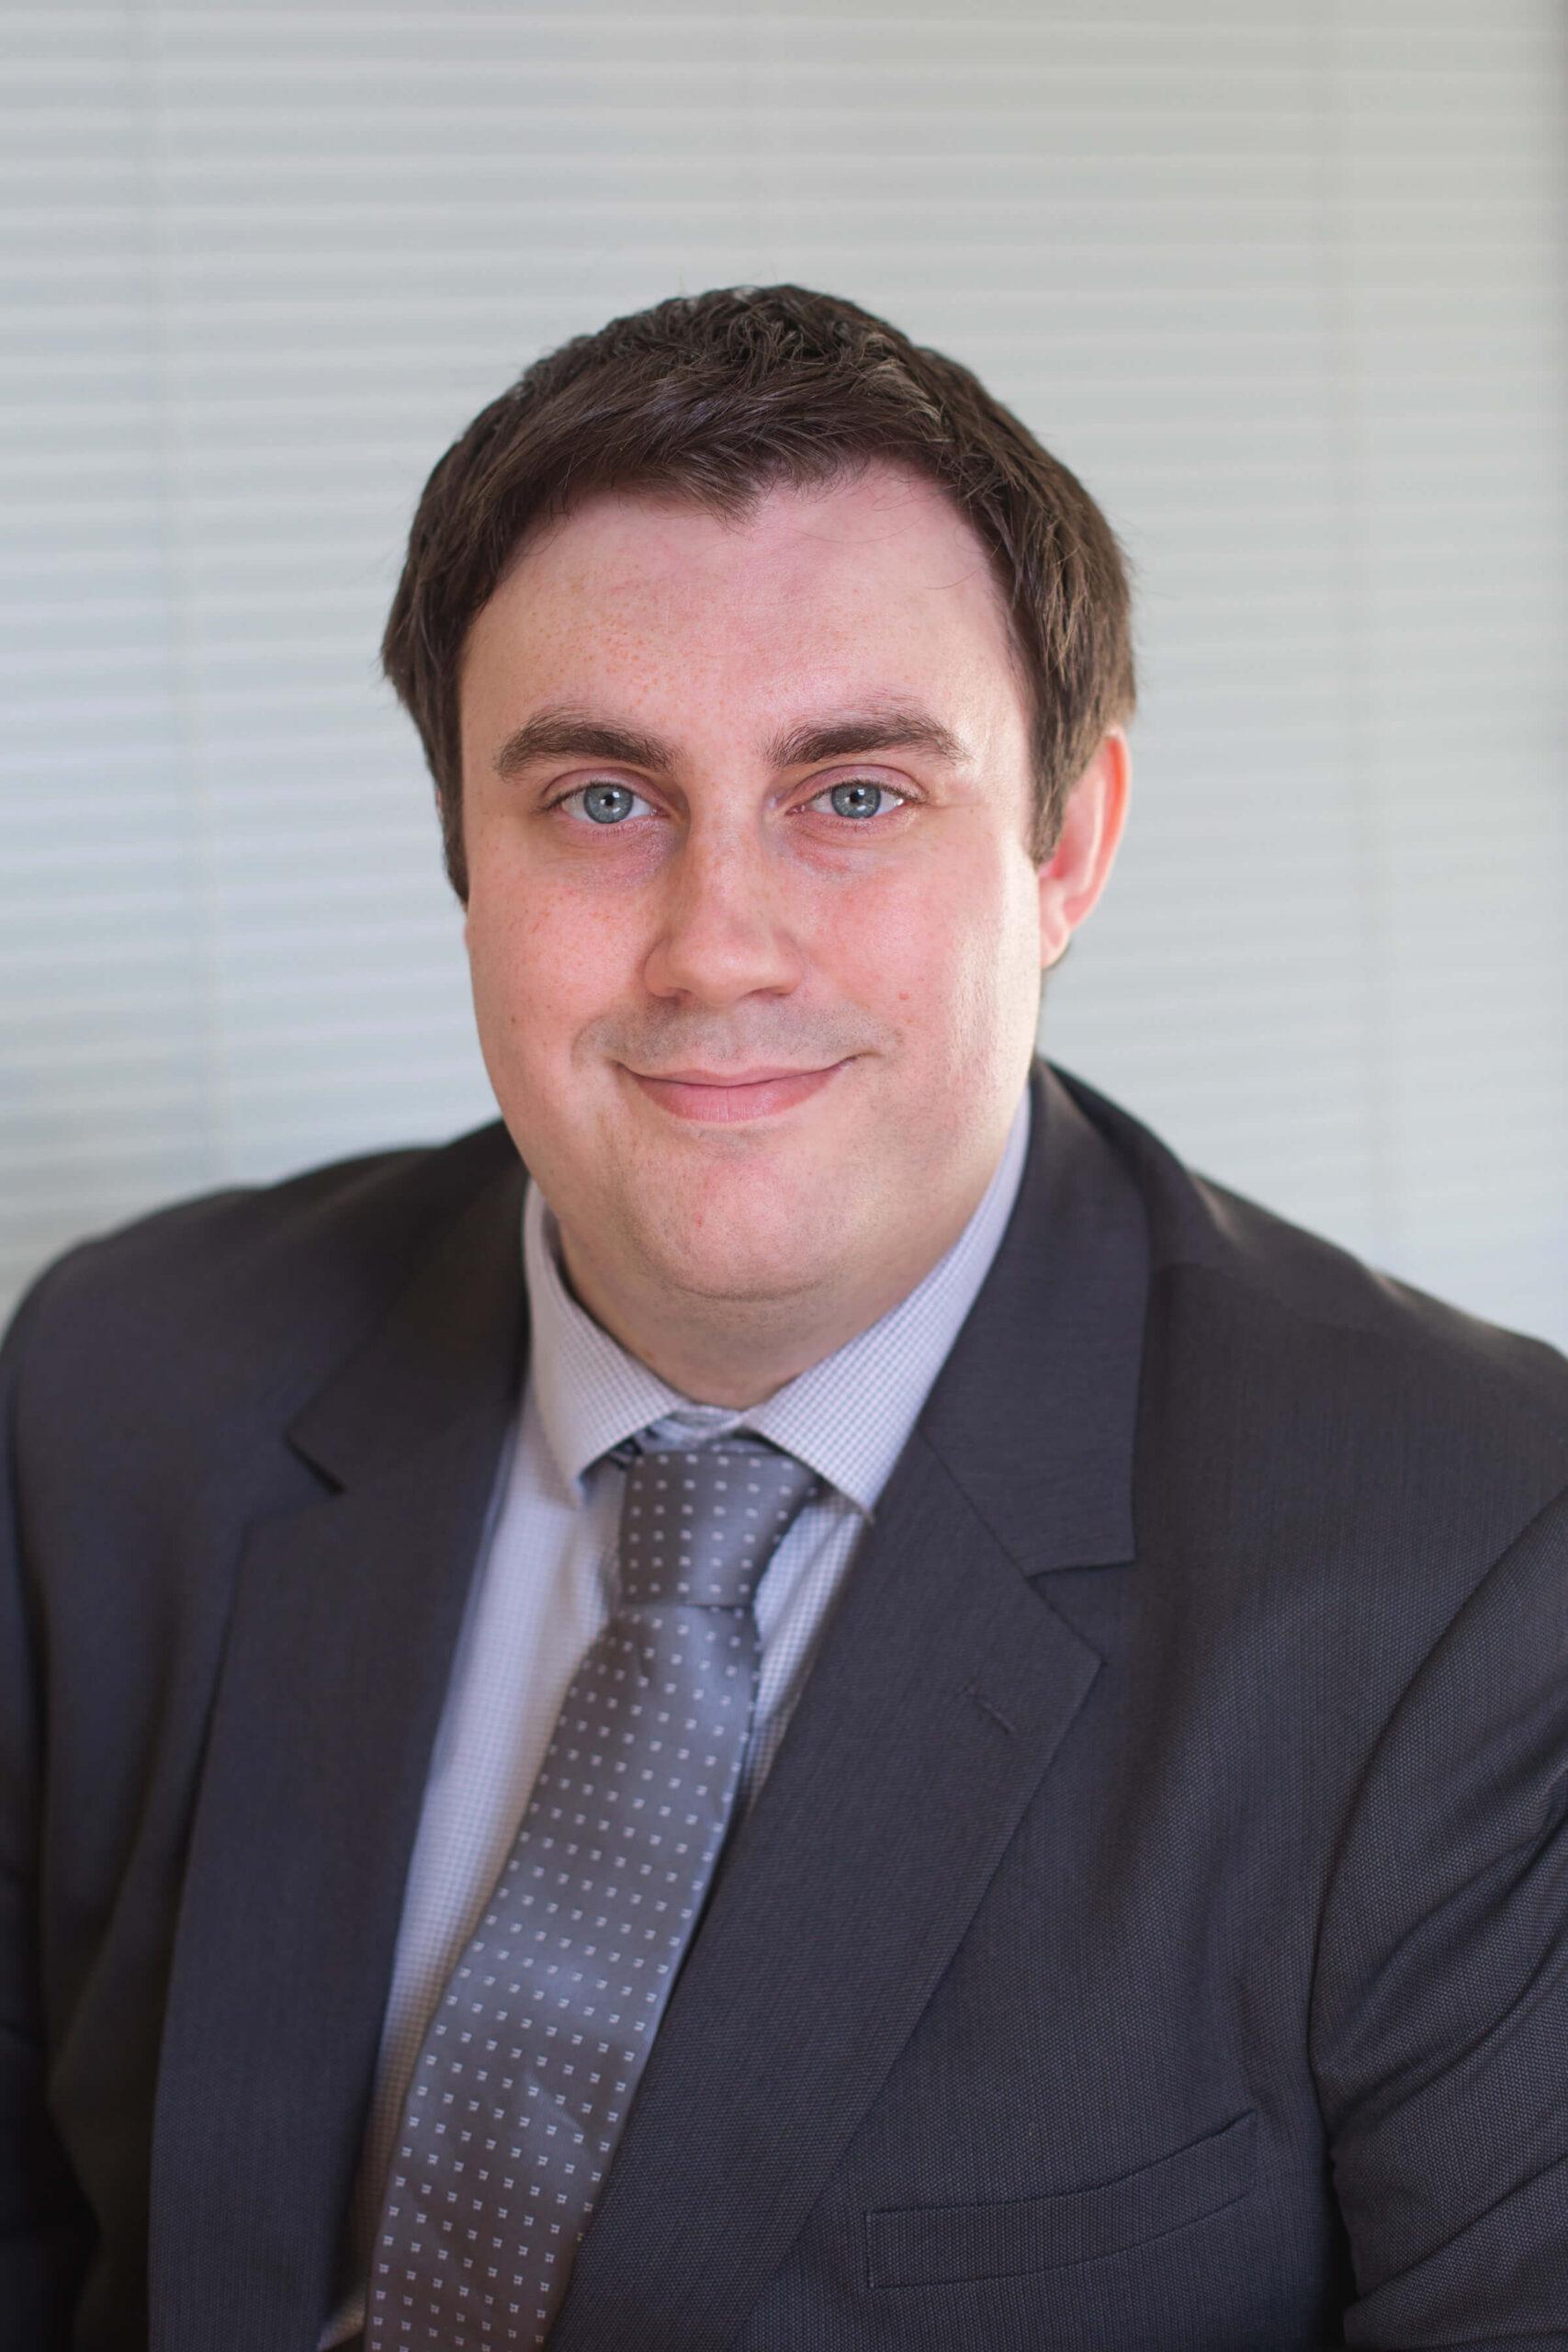 Wayne Sisson